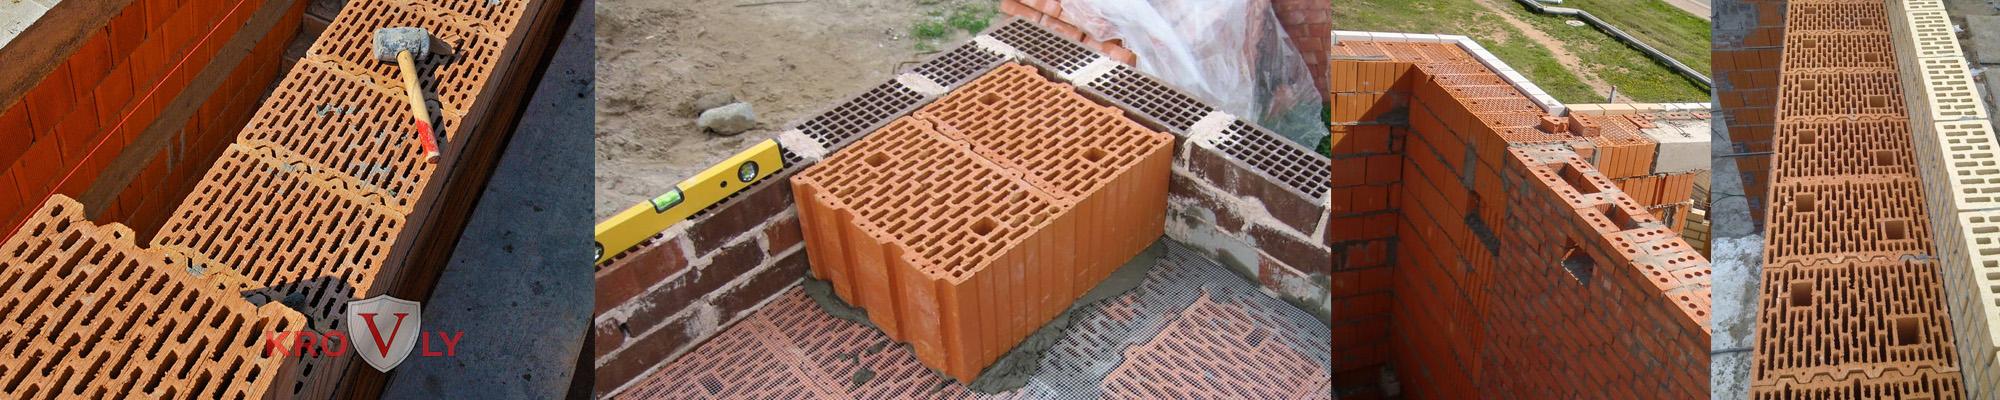 Керамоблок. Укладка керамоблока различных форматов. Стены из керамоблока. Утепление керамоблоком